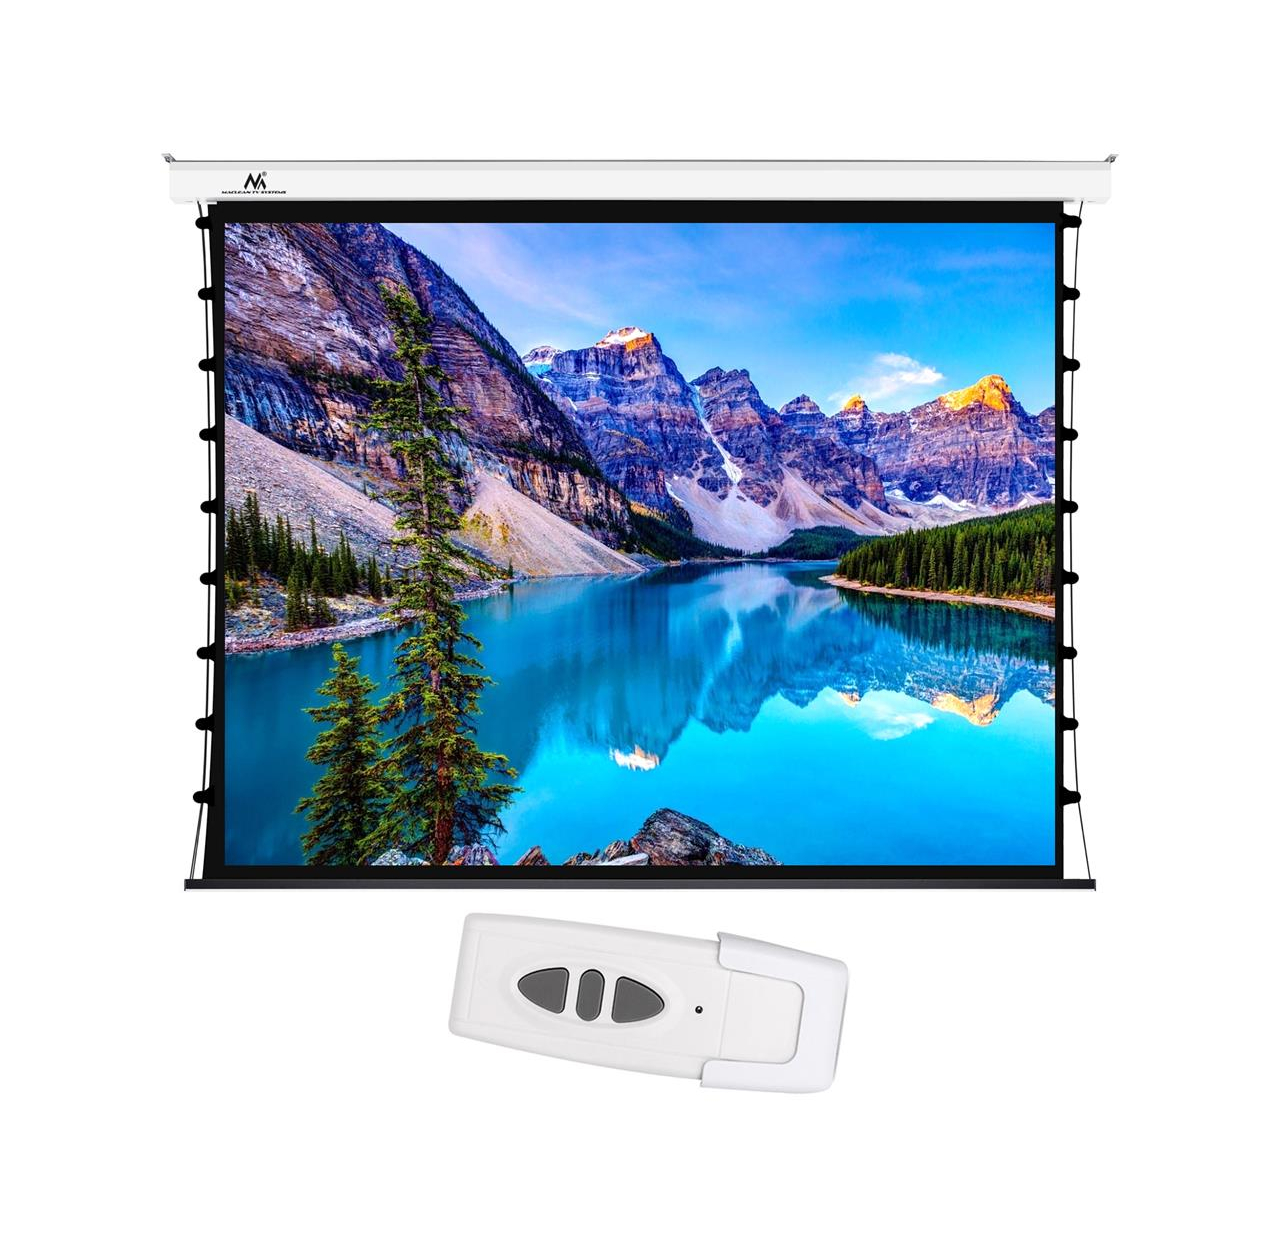 Maclean Mc 993 Ekran Elektryczny Z Mc 993 Netland24 Pl